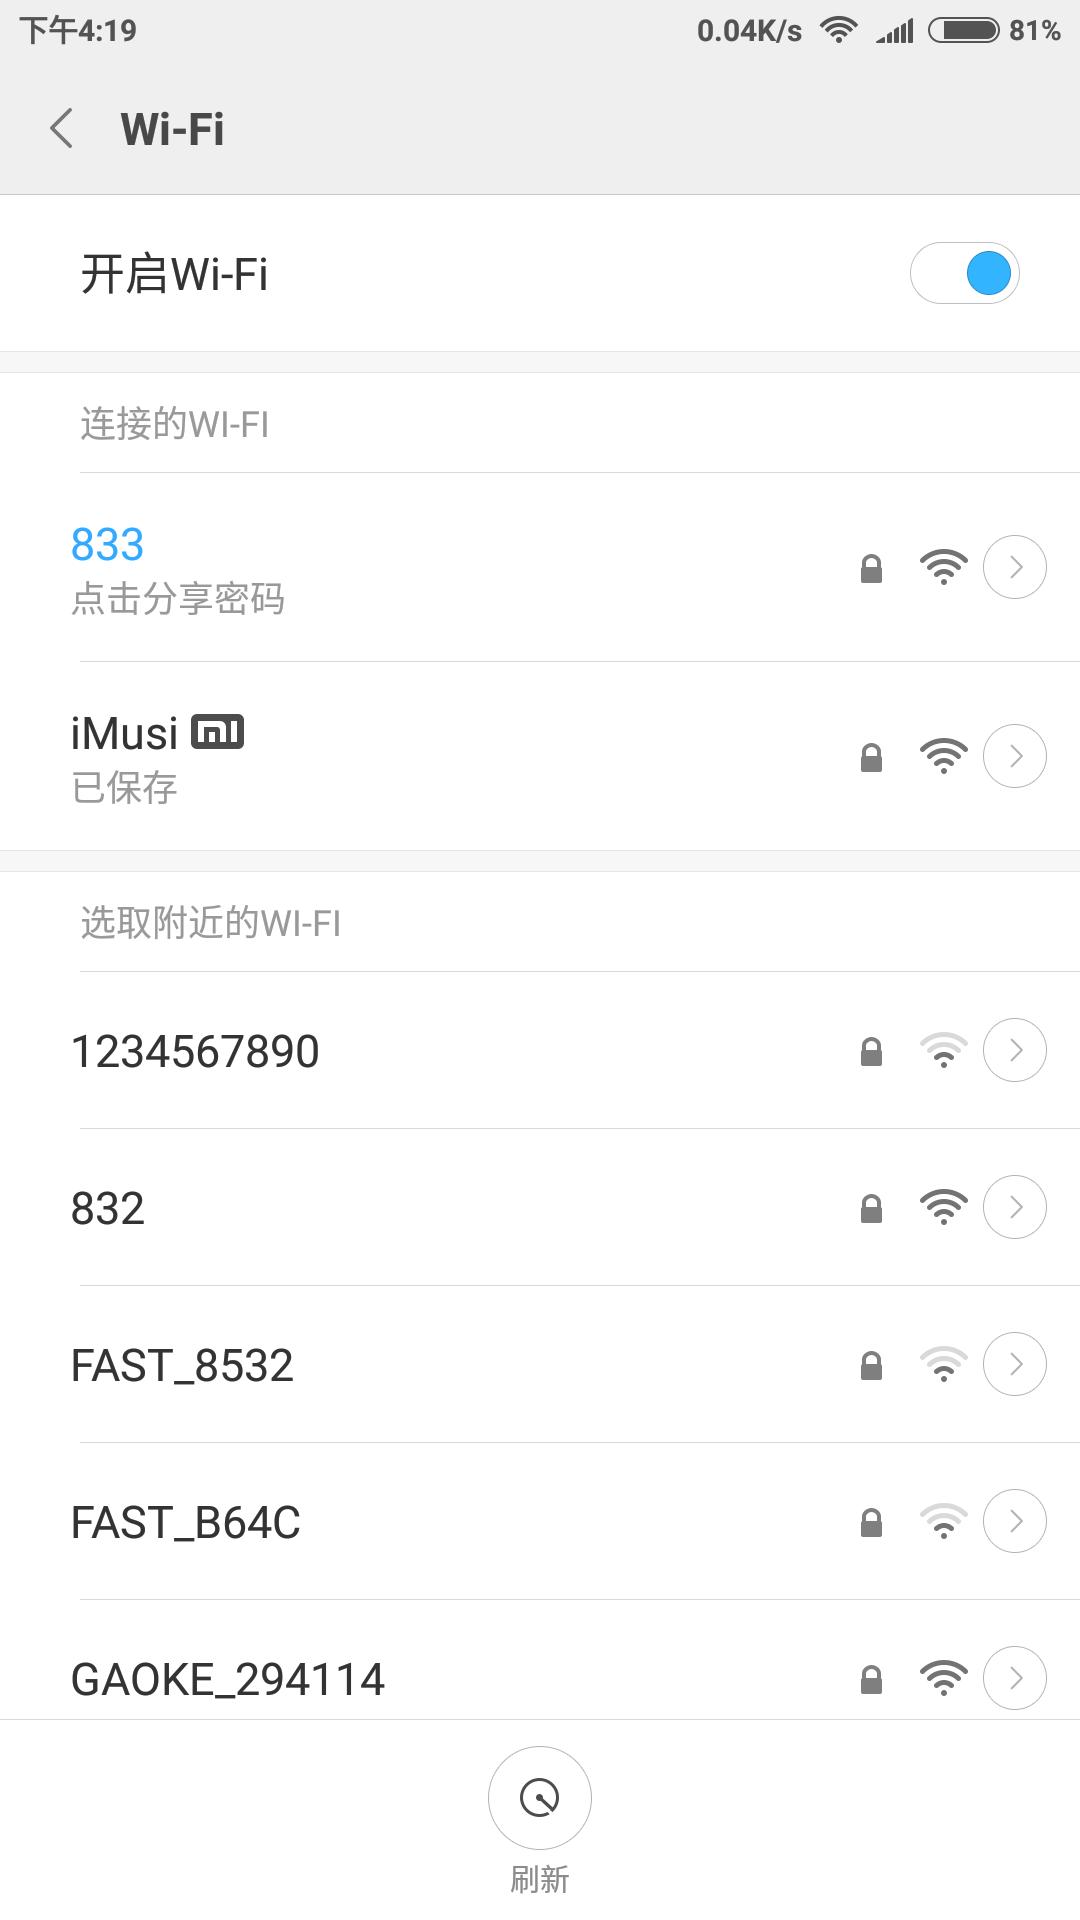 Screenshot_2016-10-22-16-19-36-490_com.android.se.png